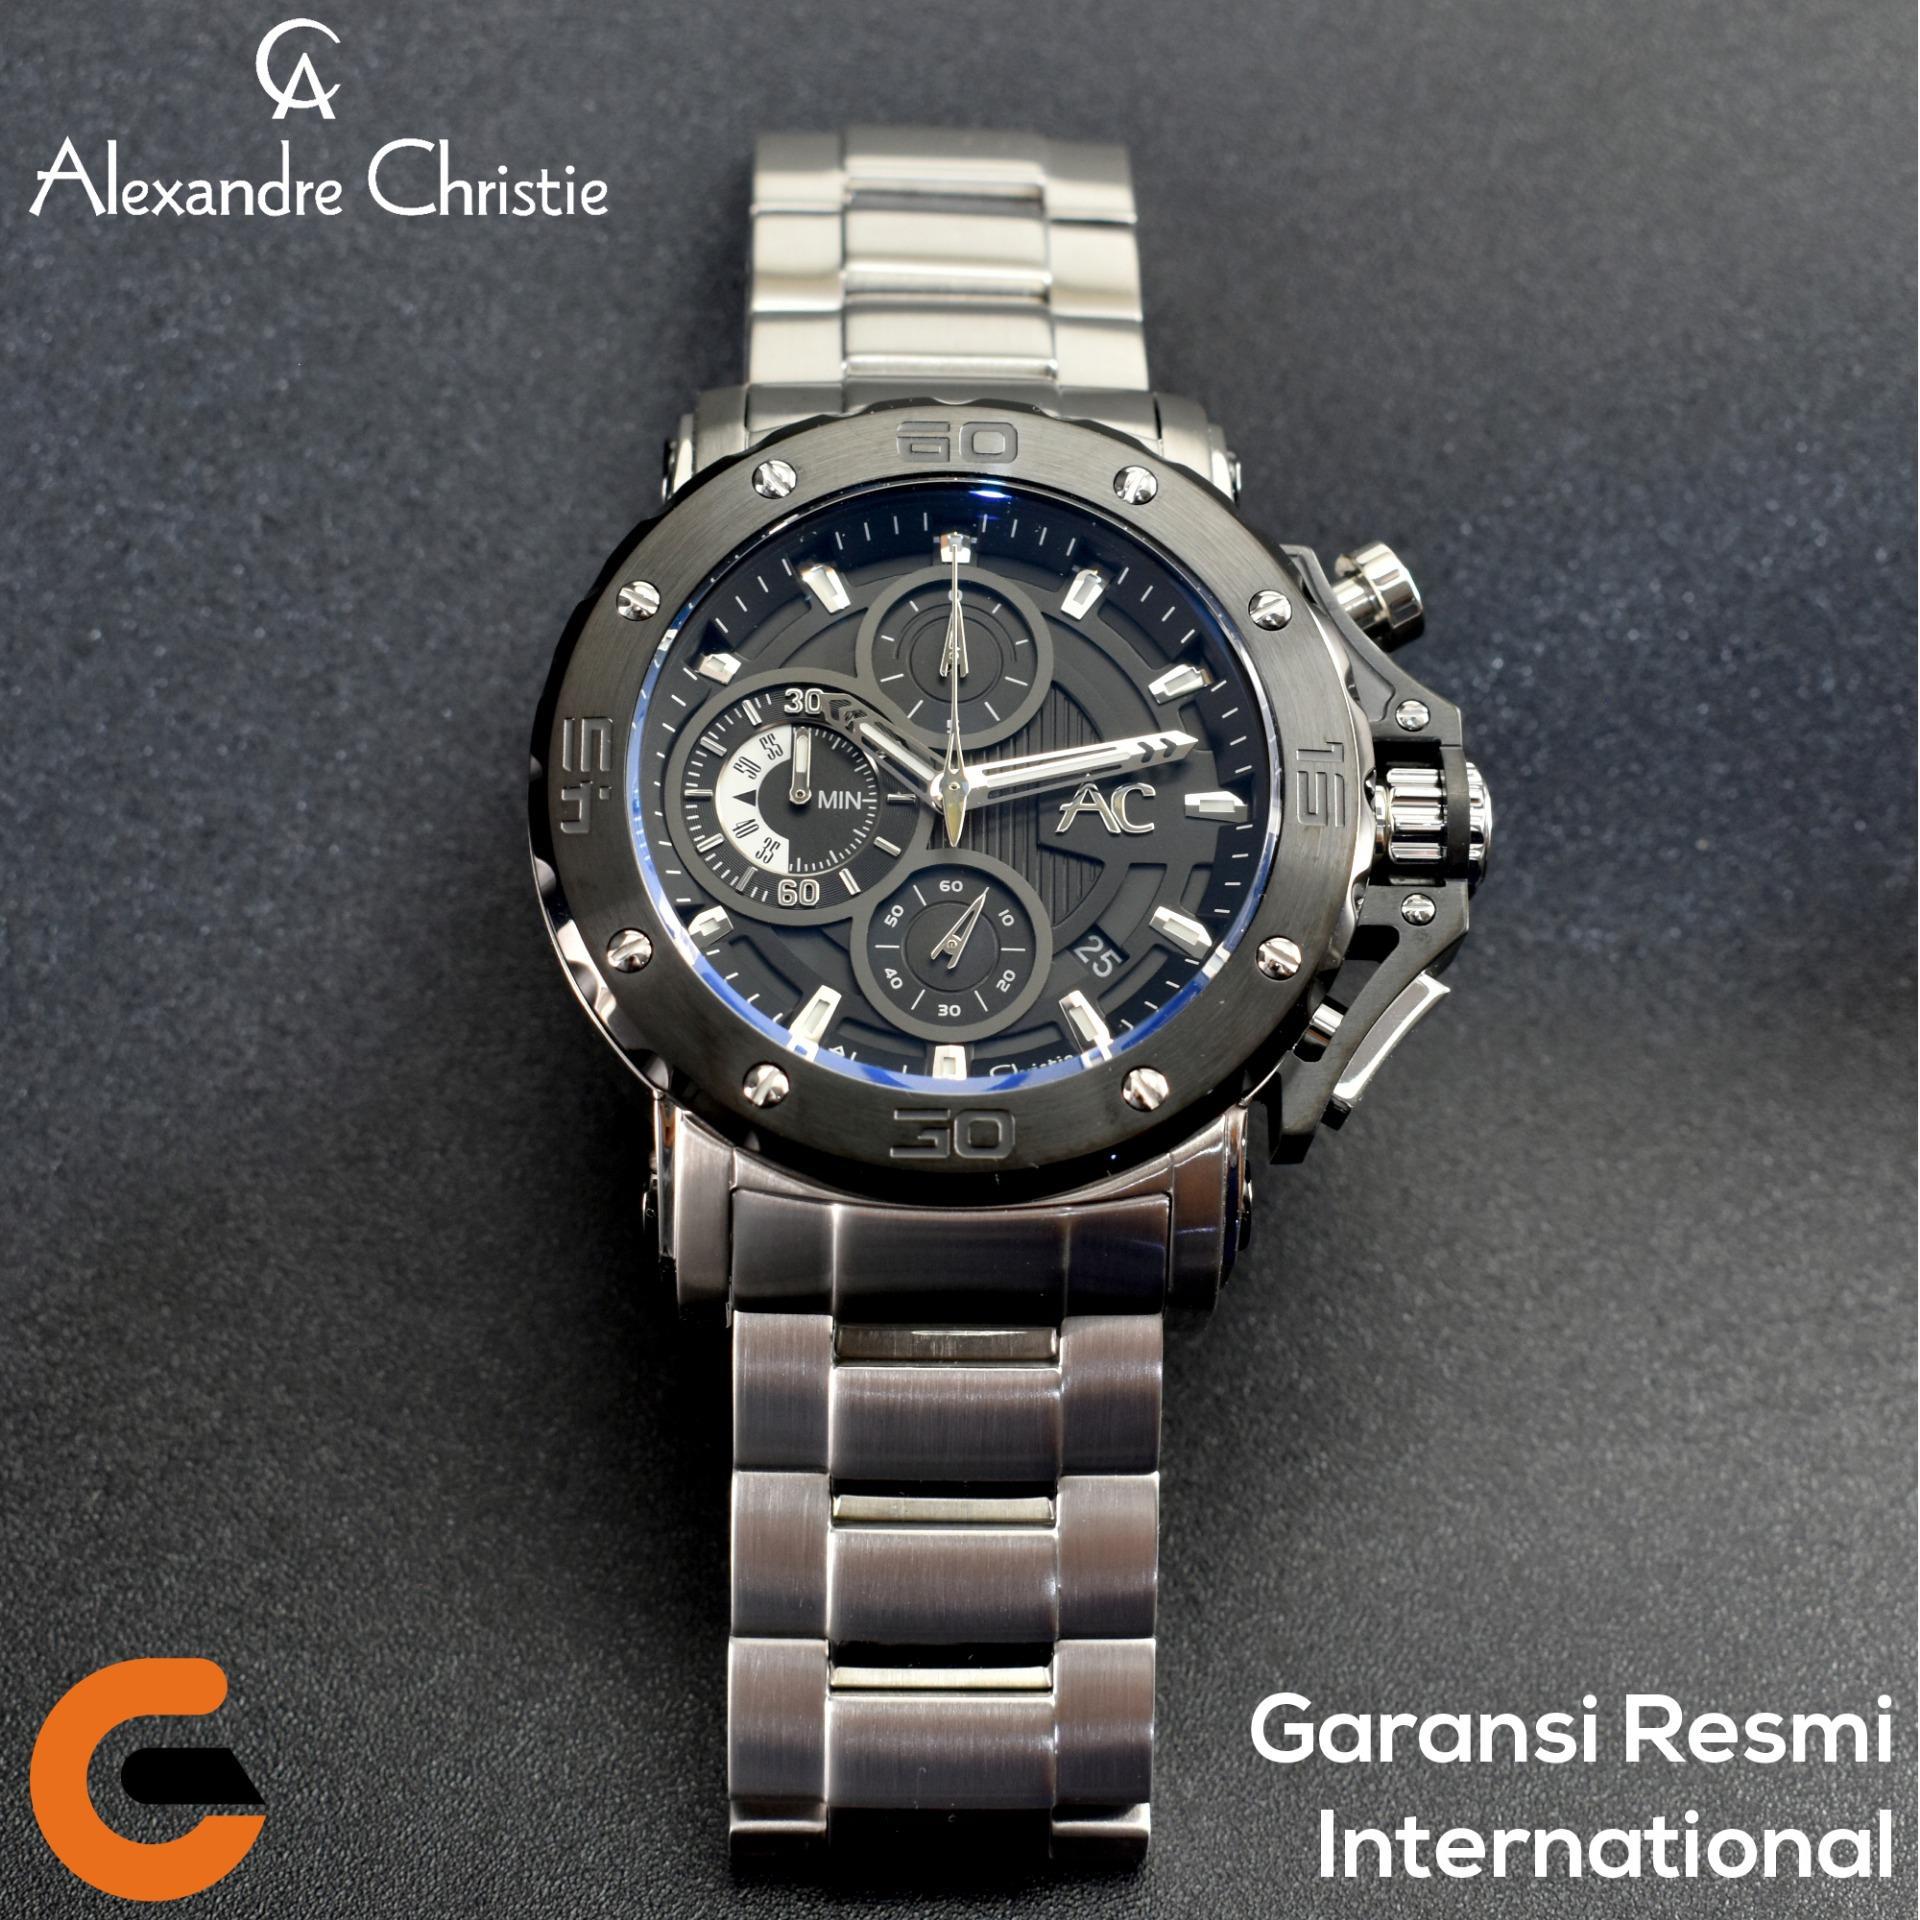 Alexandre Christie Jam Tangan Pria Alexandre Christie AC 9205 Chronograph Tali Rantai Logam Stainless Steel Hitam